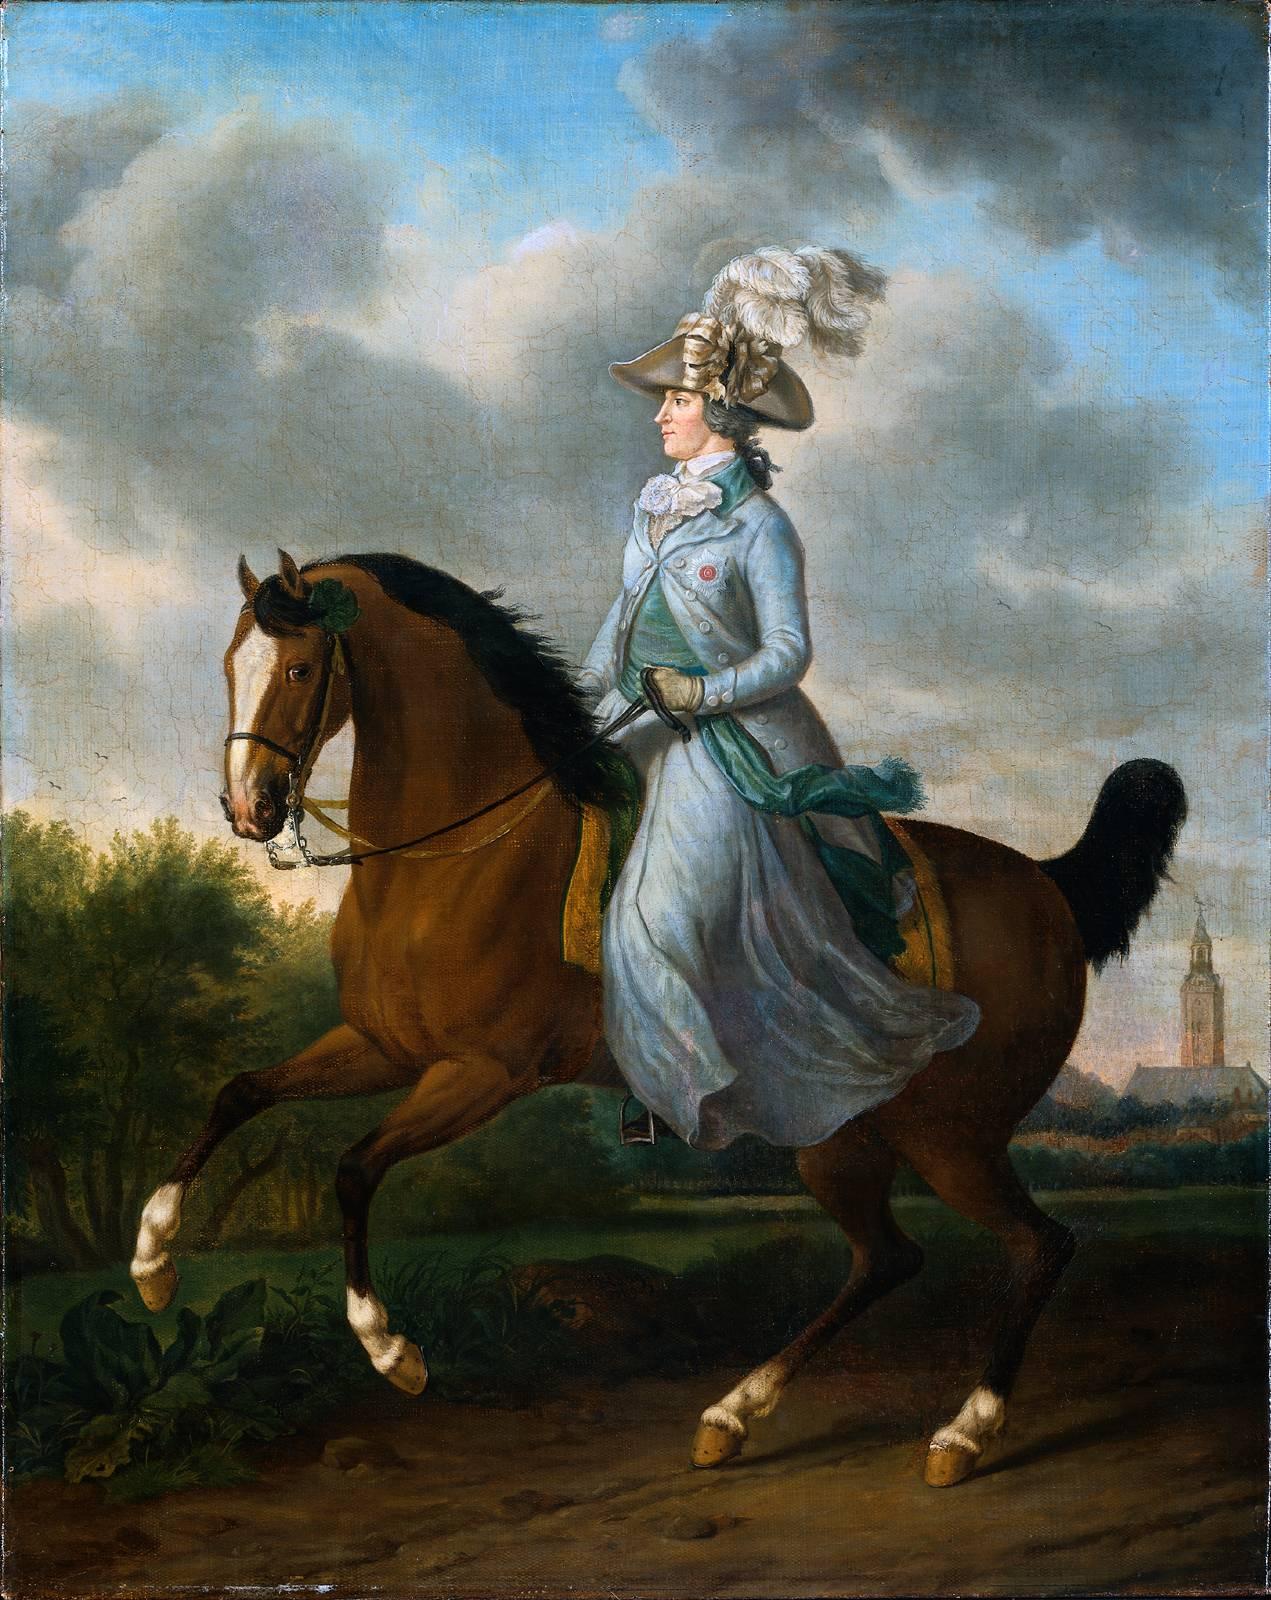 Zelter Pferd : Damensattel